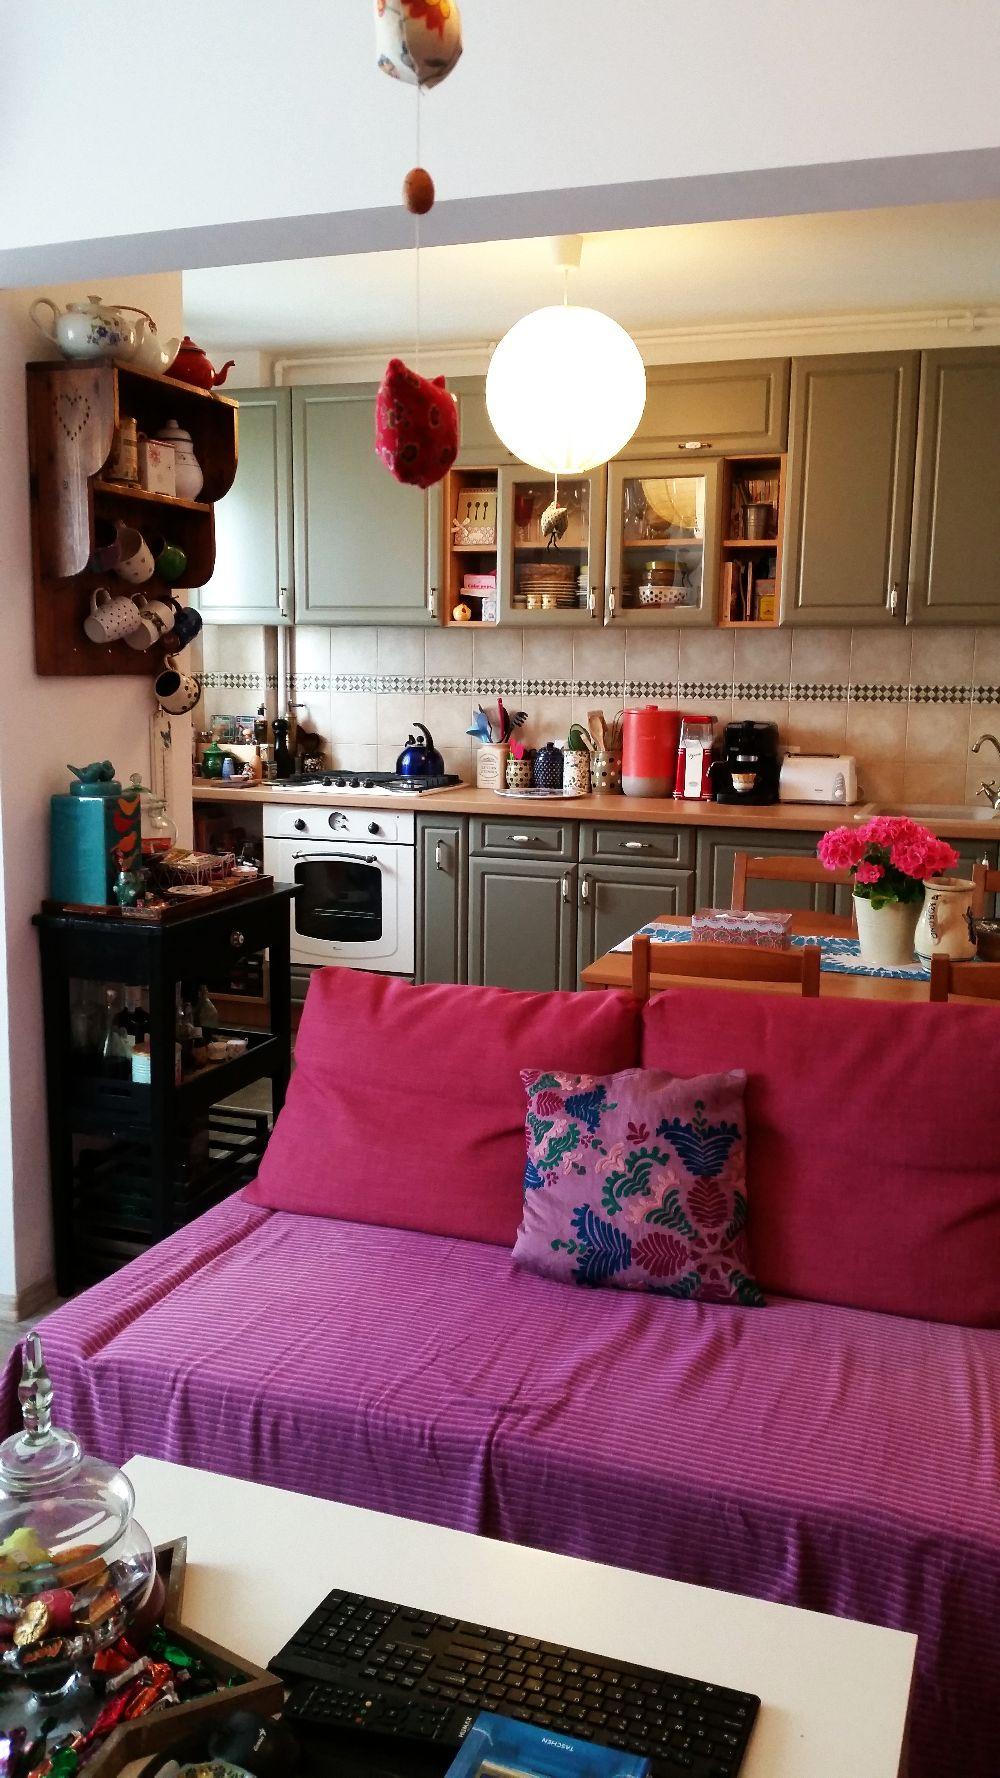 adelaparvu.com despre apartament 3 camere colorat in Sibiu, Foto Adela Parvu (45)